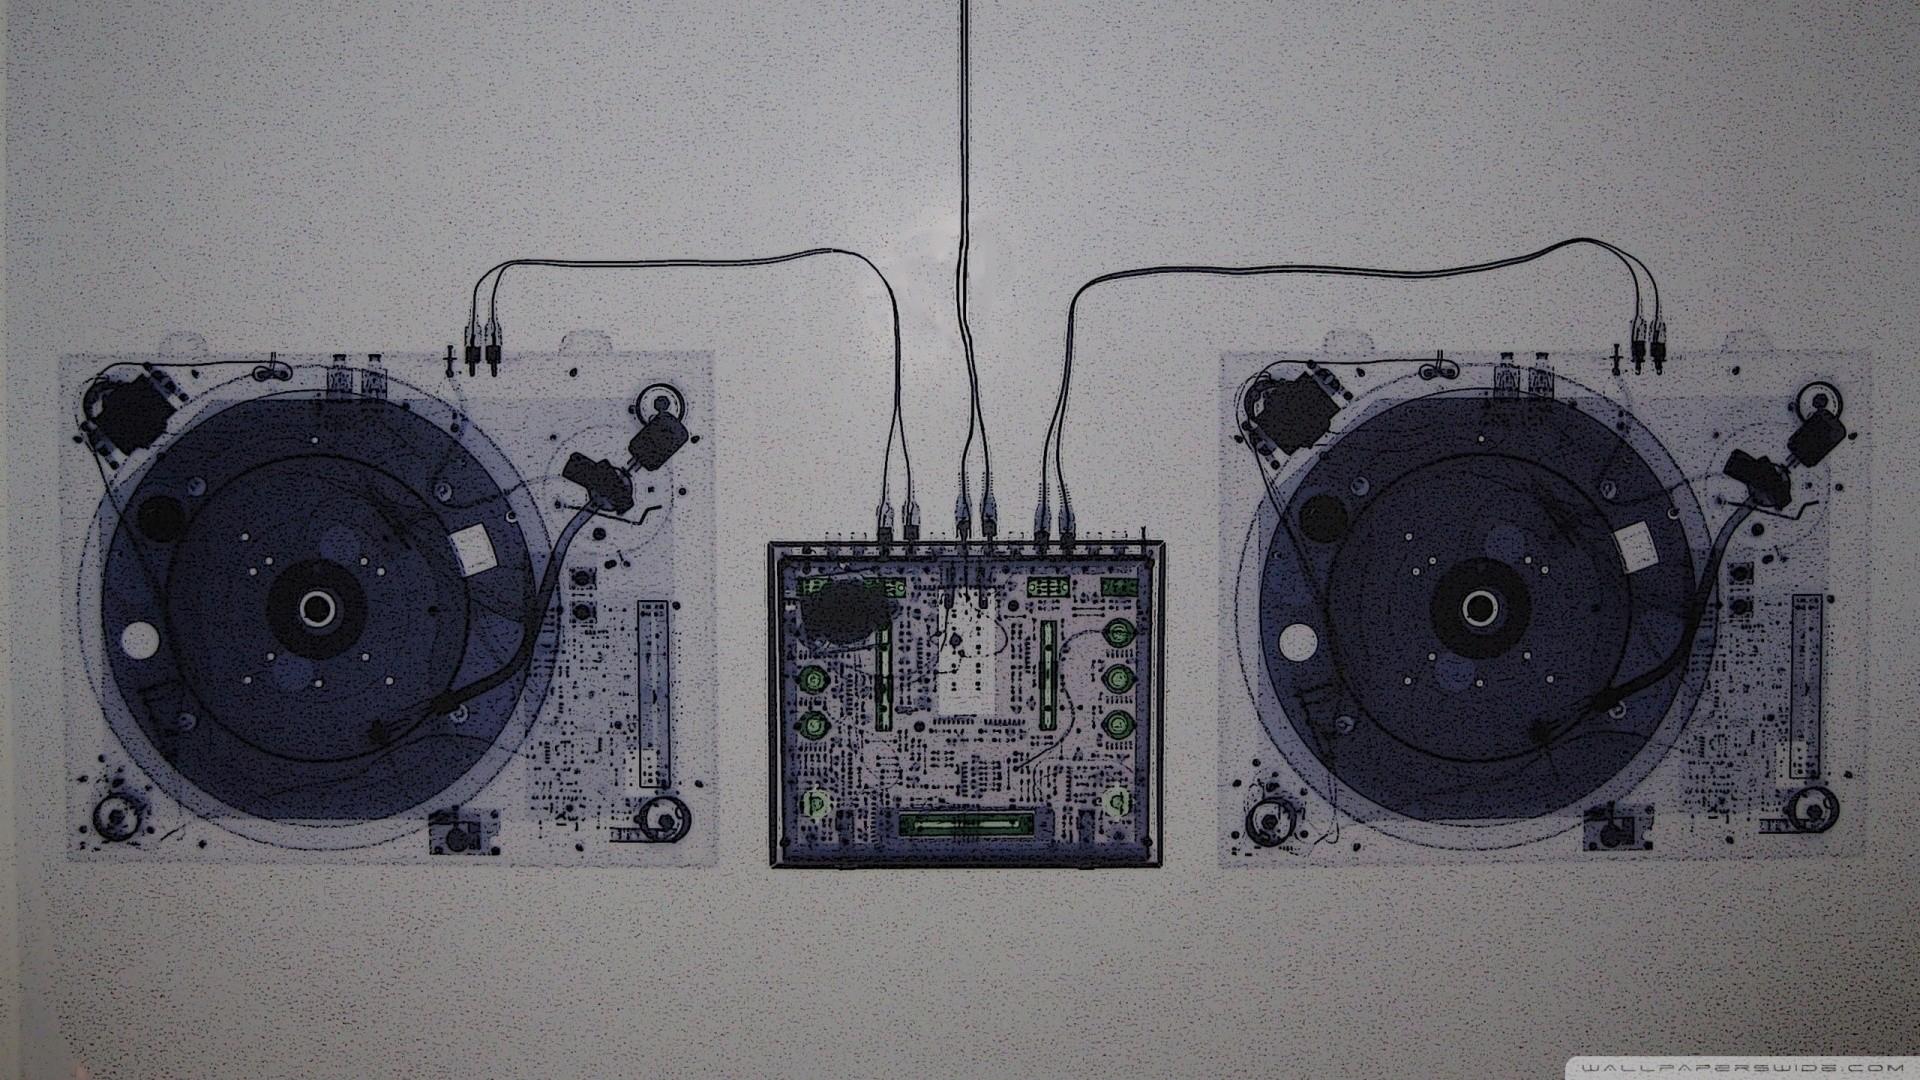 … translucent dj console mixer hd desktop wallpaper high …